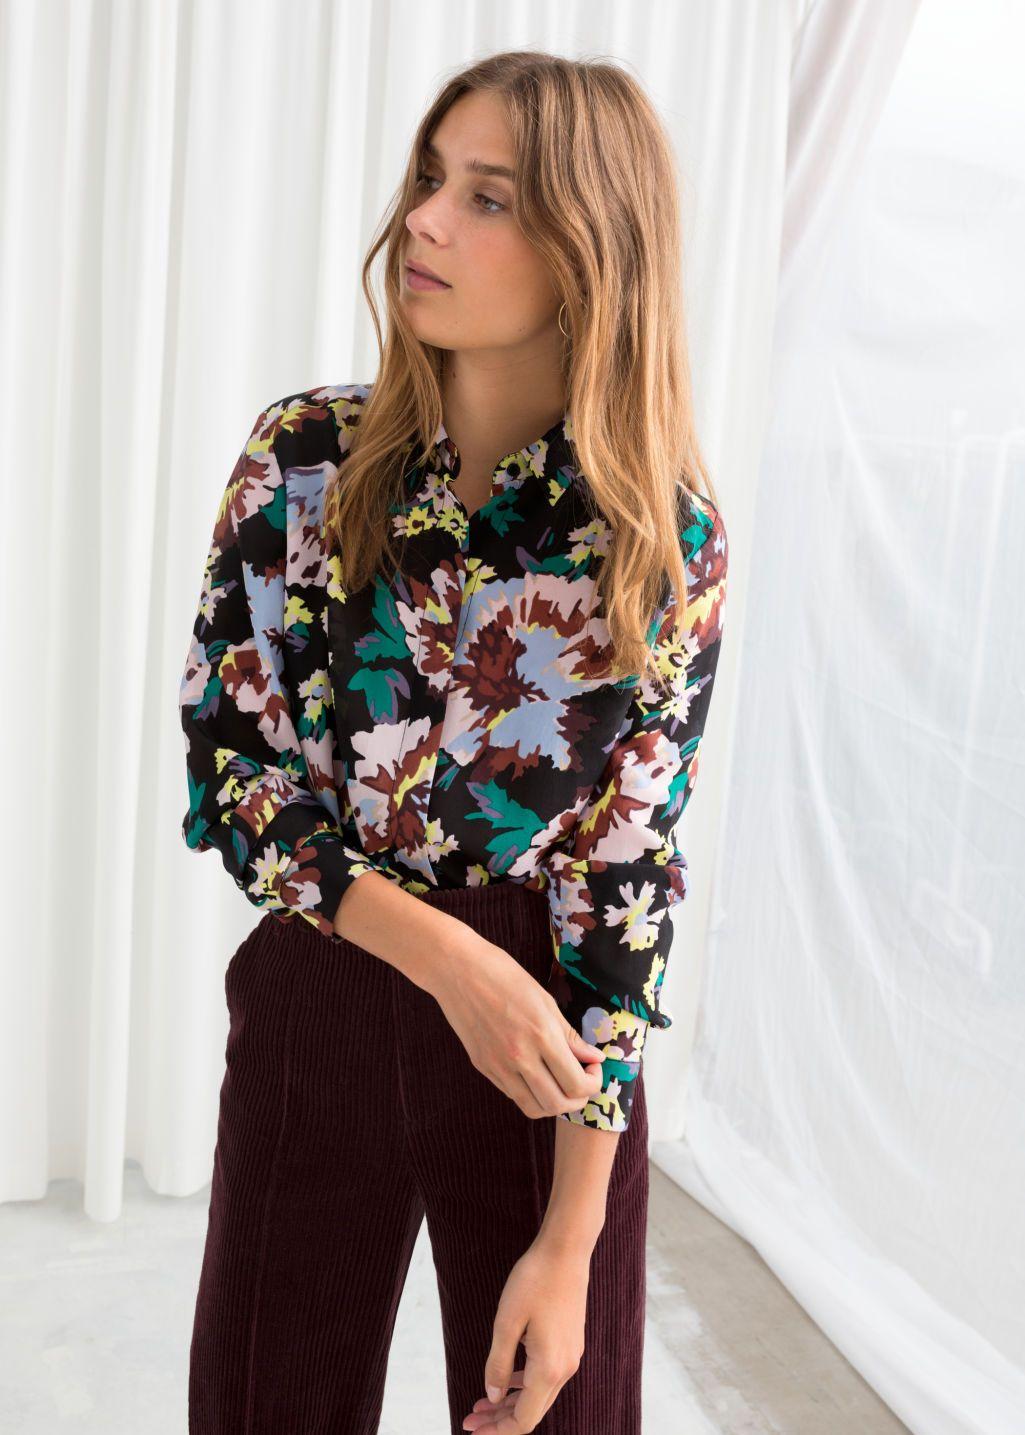 ce268e89748c0b Silk Shirt in 2019   Style // Wish List   Shirts, Flower shirt